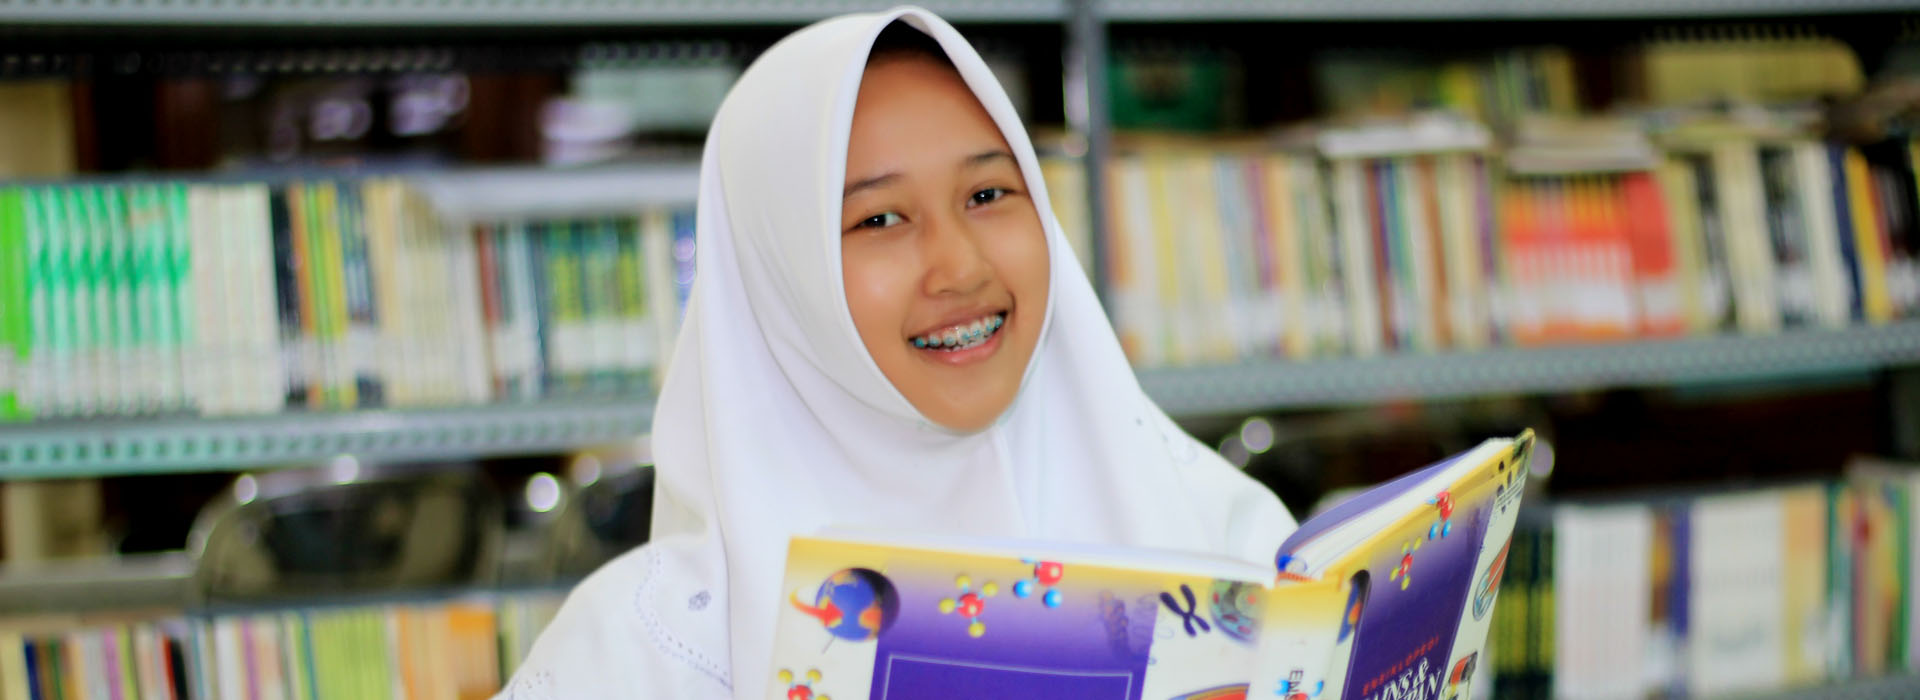 Buku Adalah Jendela Dunia…, @digilib_smanuda